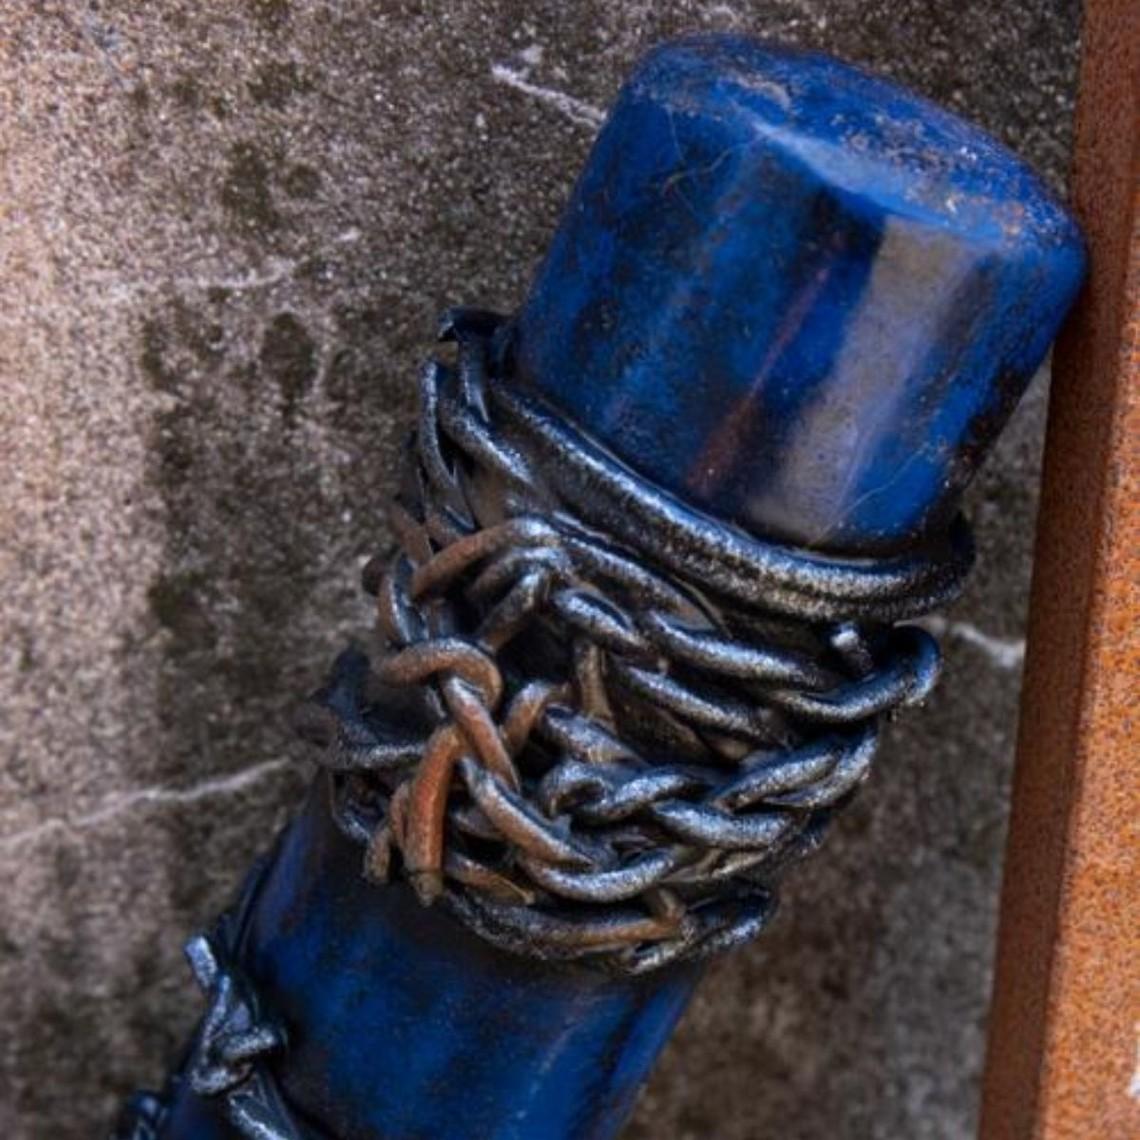 Epic Armoury LARP alambre de púas bate de béisbol, 80 cm, azul